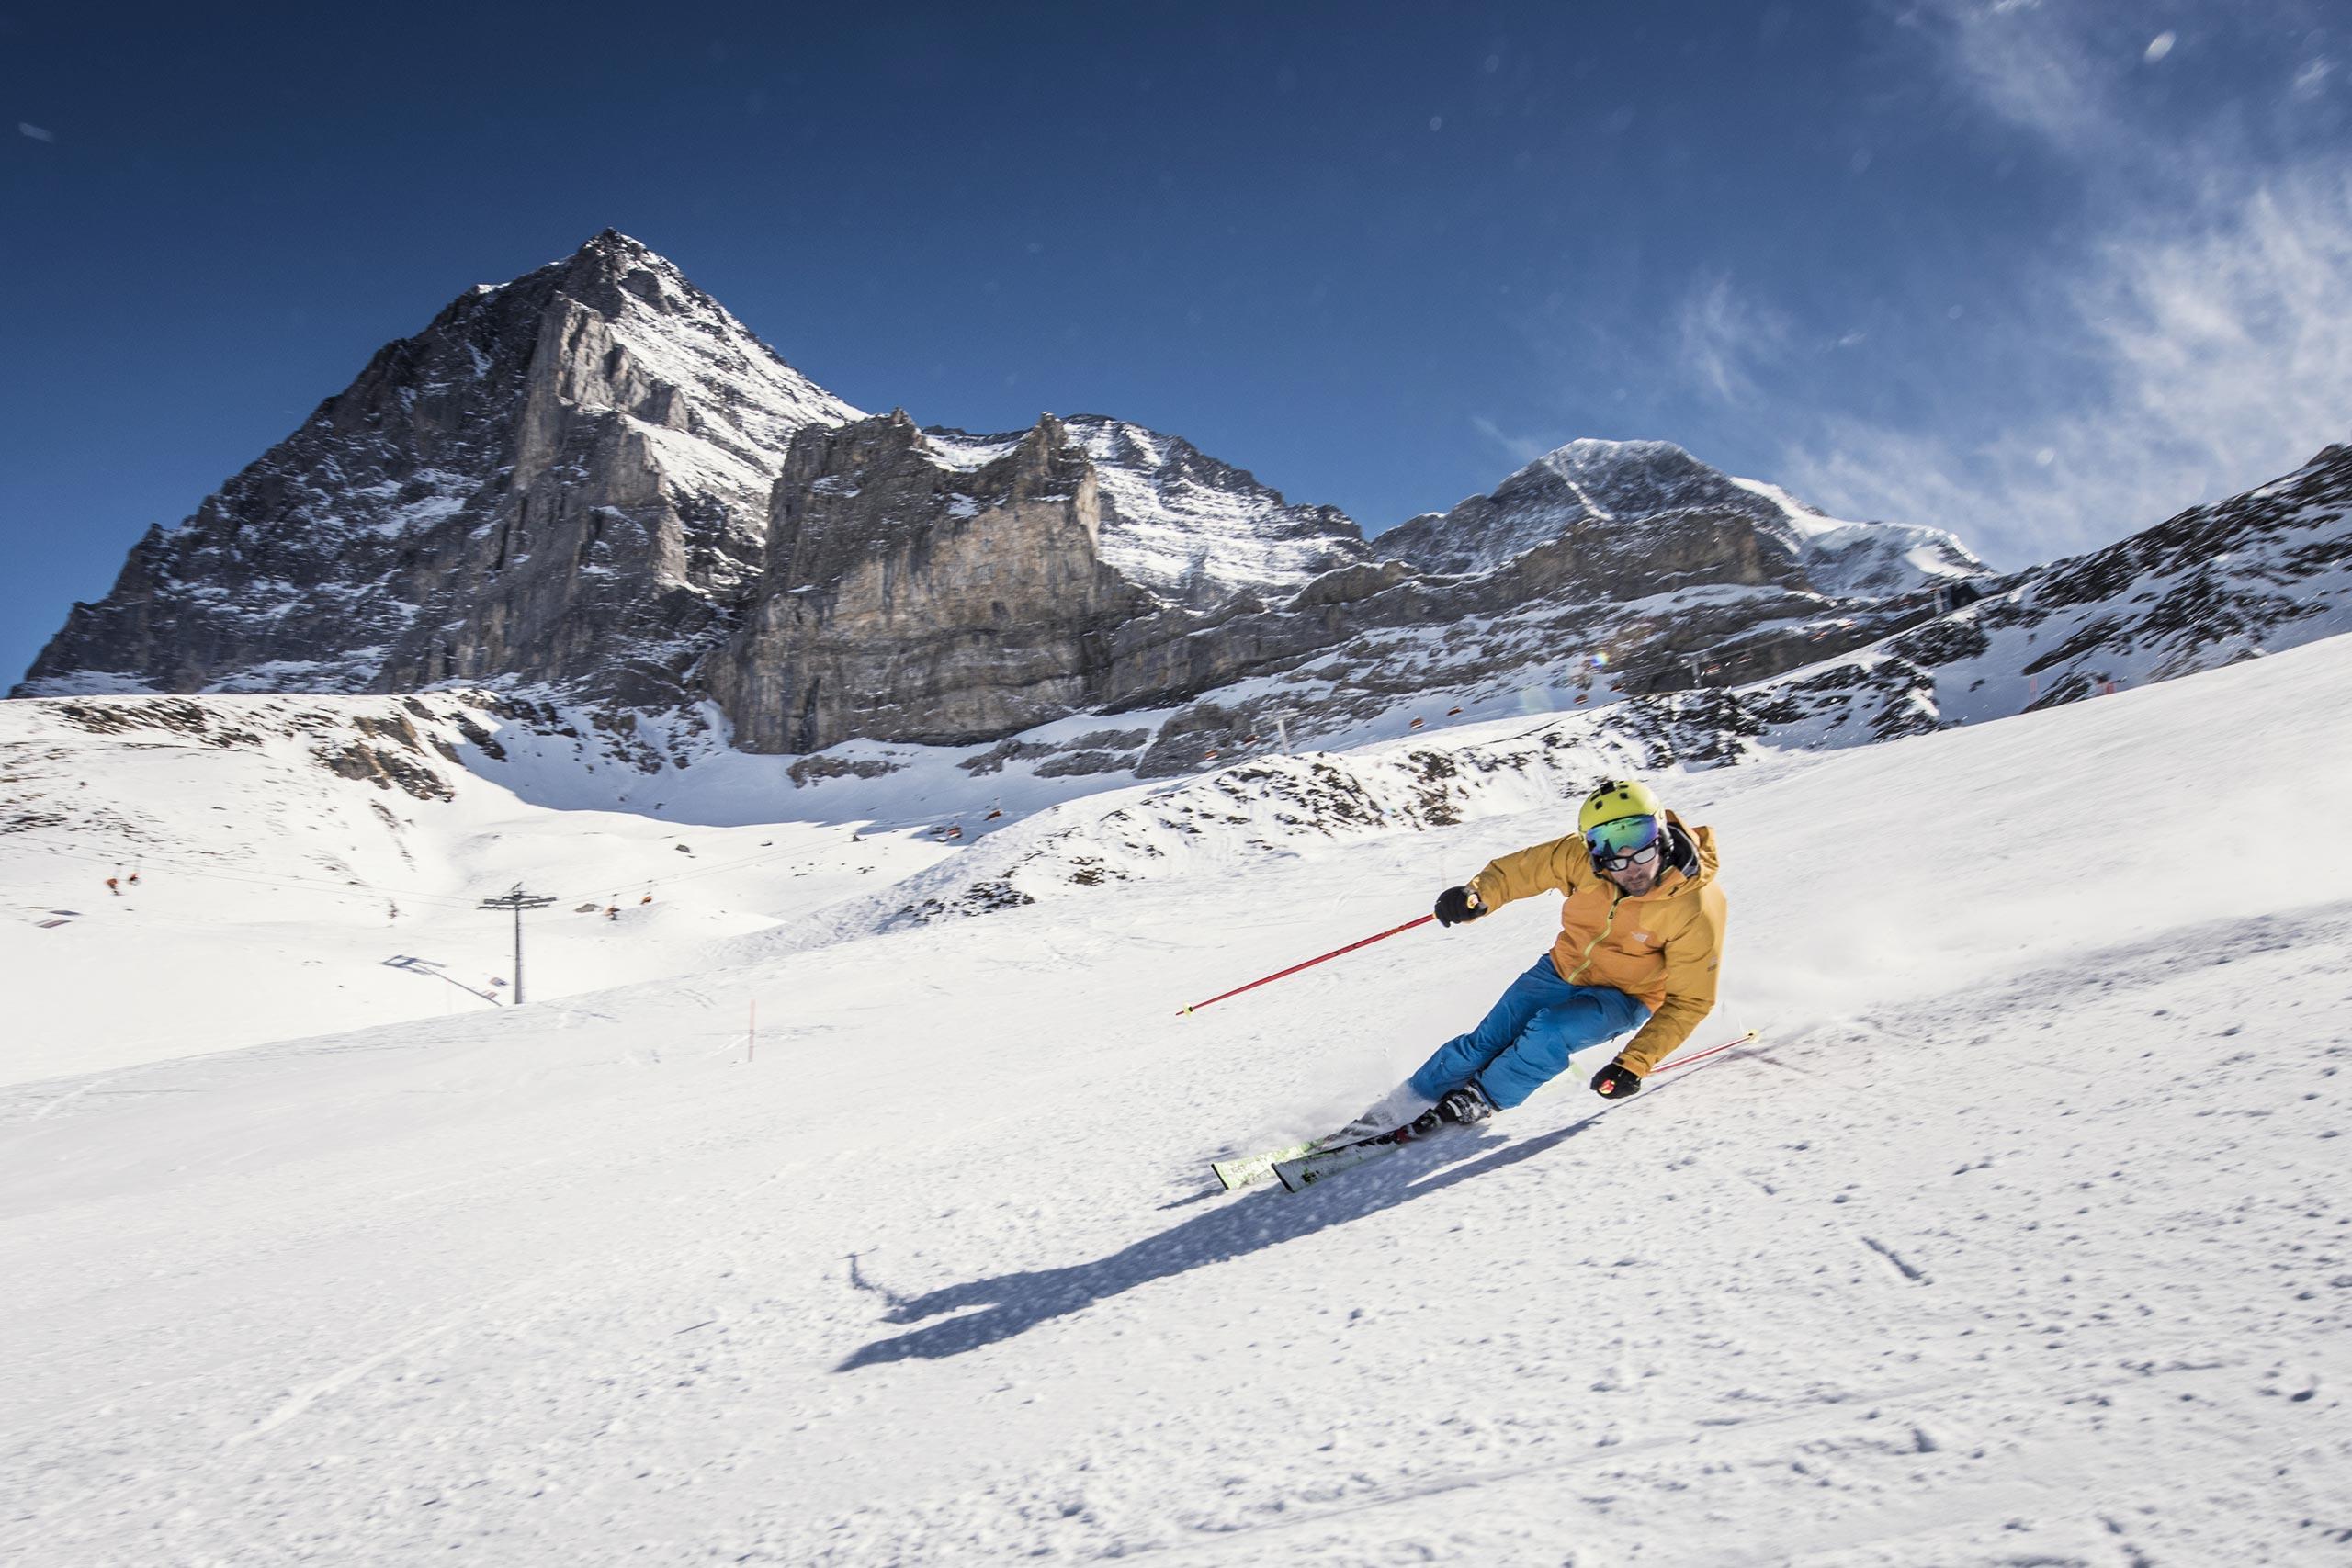 jungfrau-ski-region-skifahrer-winter-schnee-piste.jpg